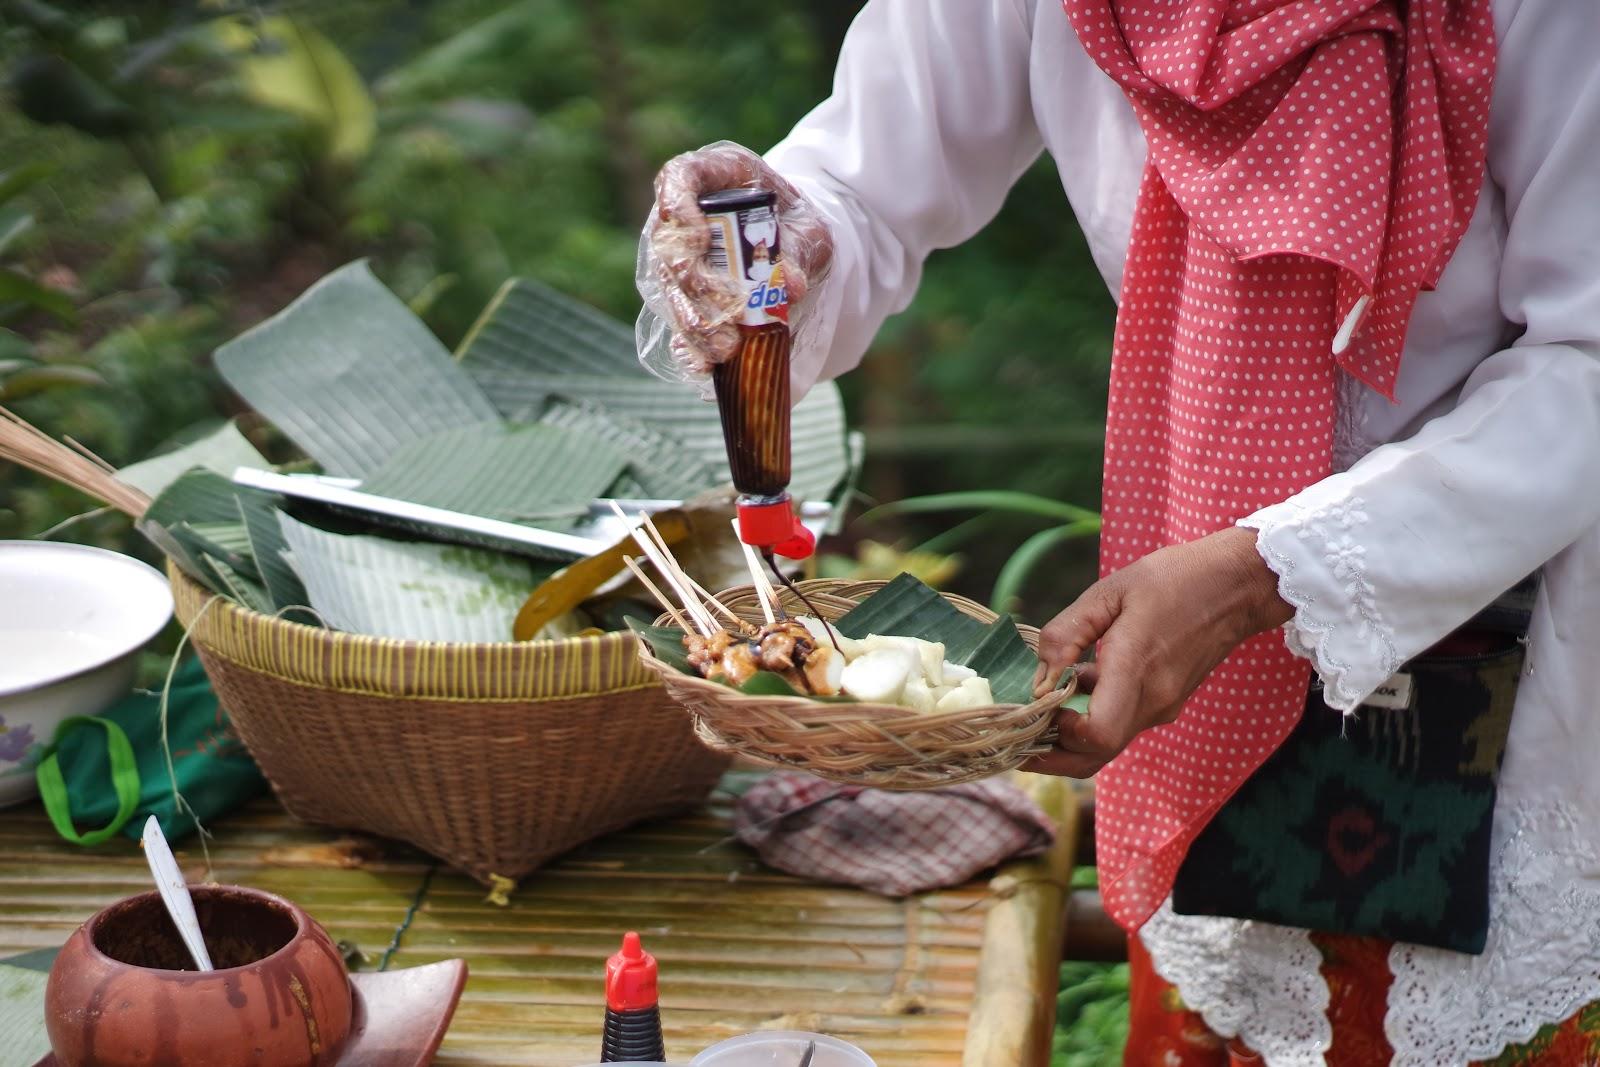 Serunya Wisata Alam Dan Kuliner Di Pasar Pancingan Lombok Jalan Jalan Makan Makan